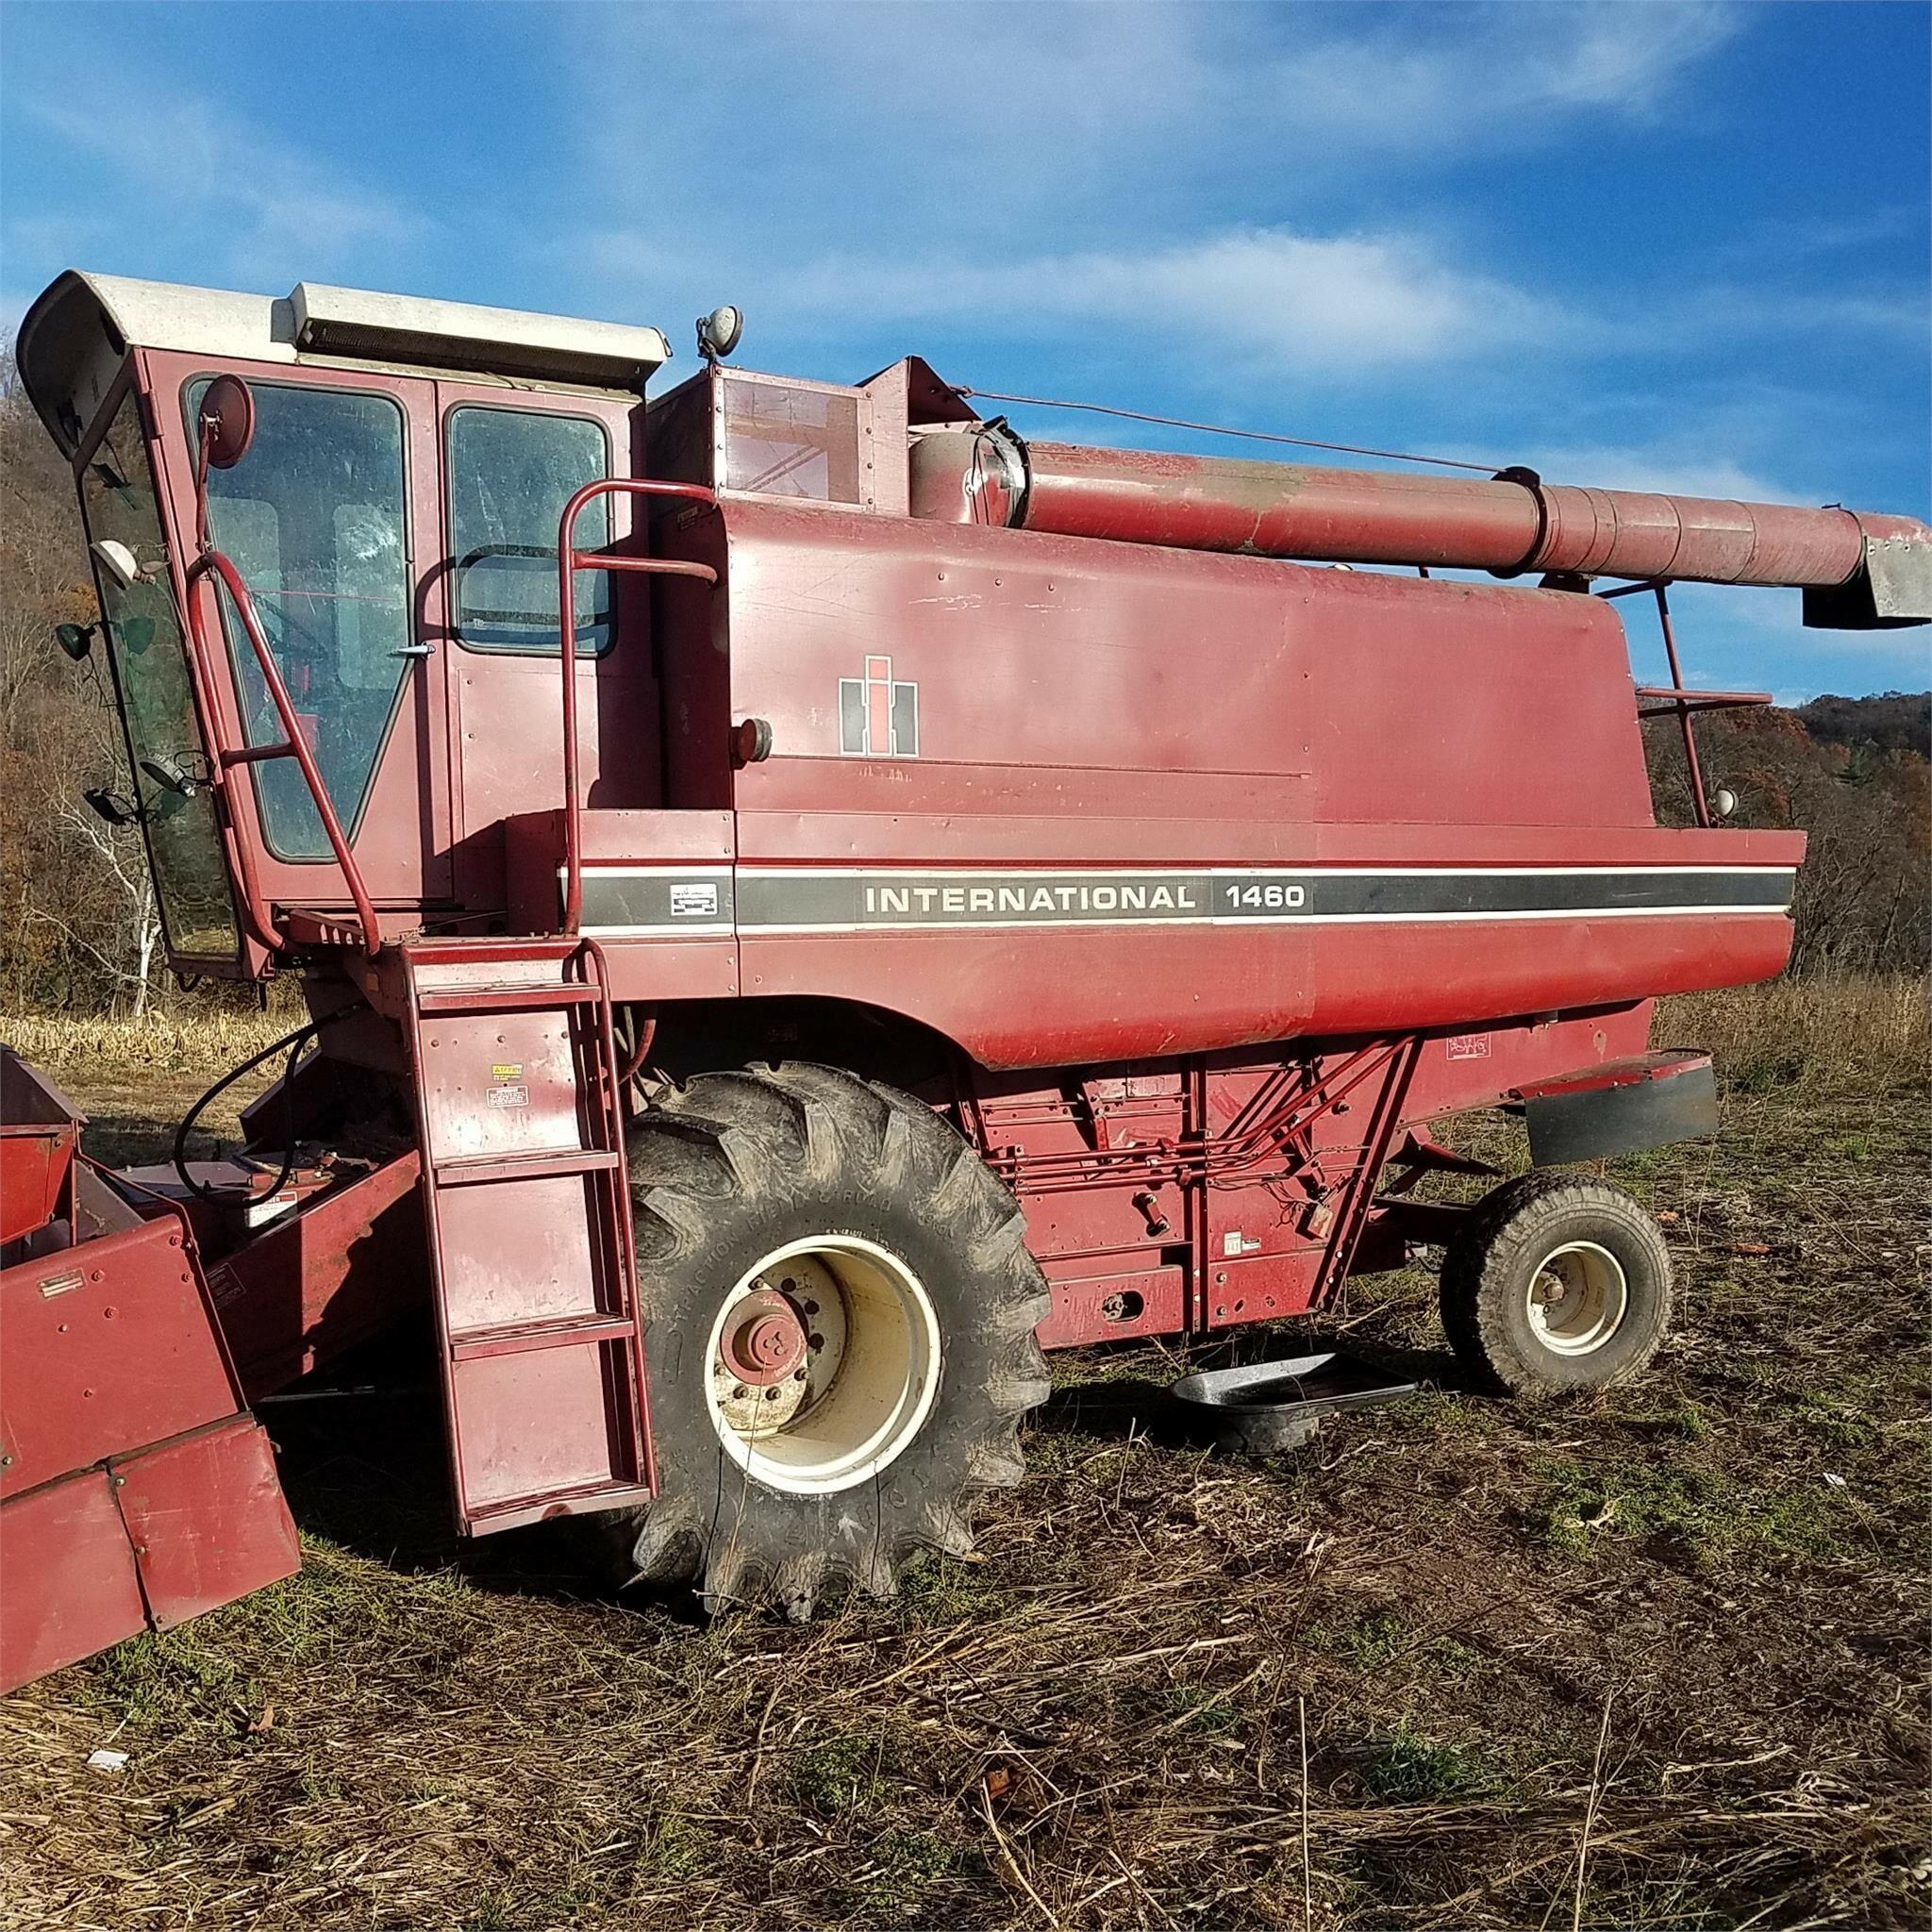 International Harvester 1460 Combine